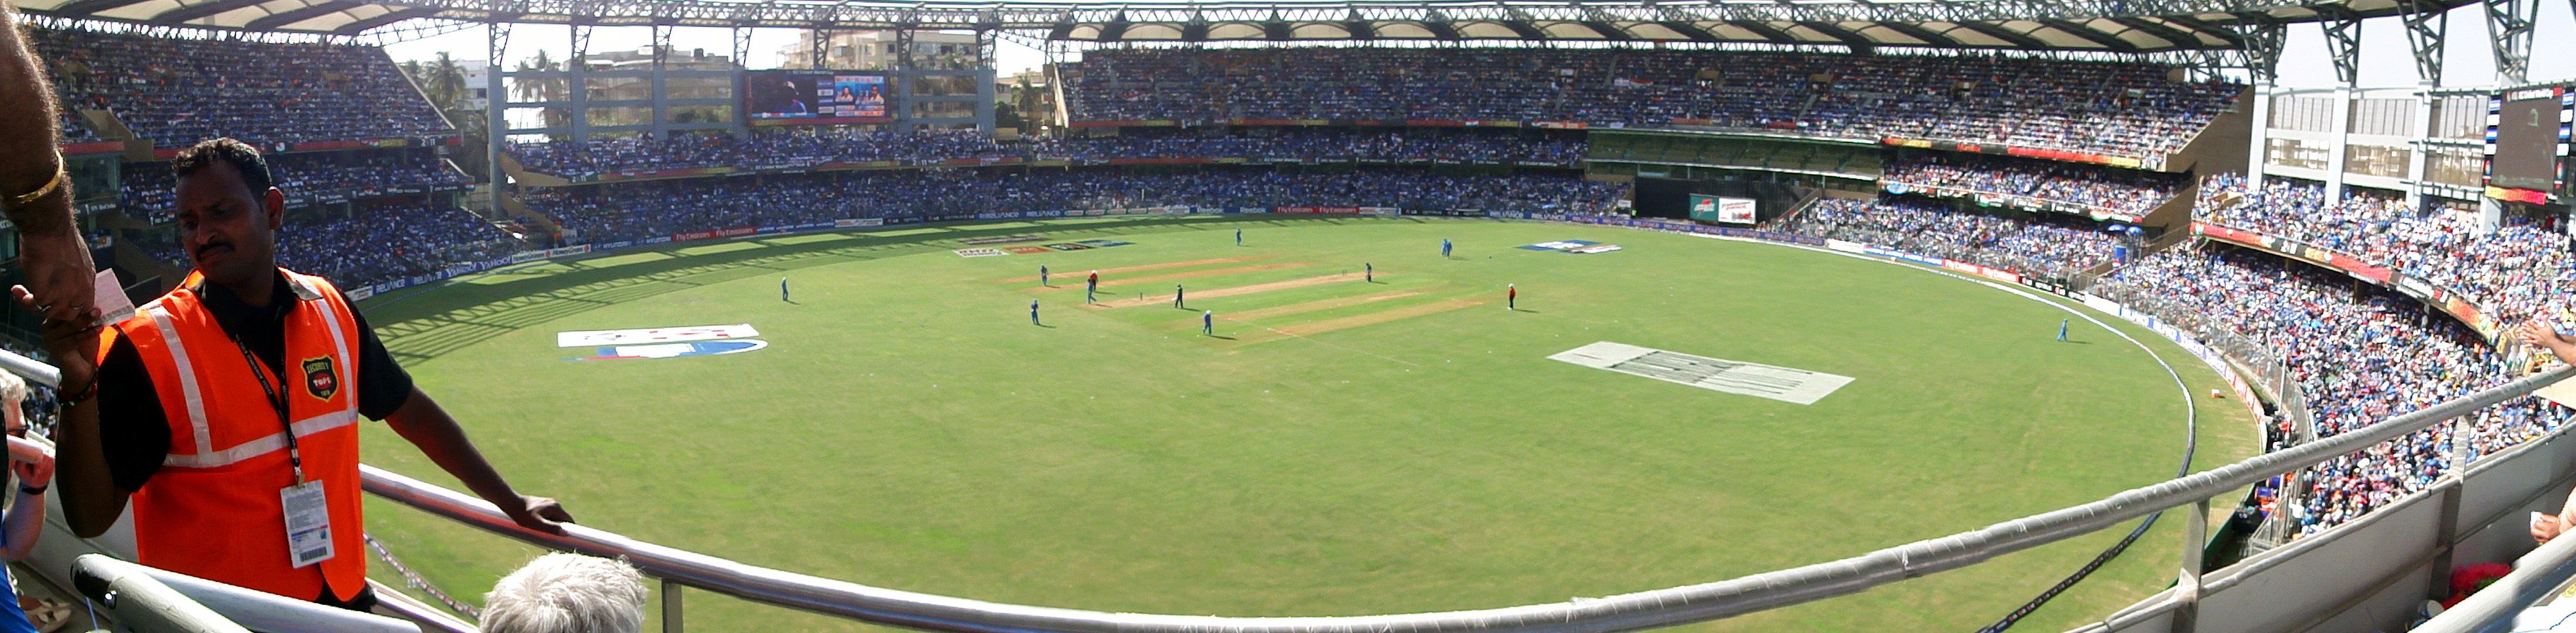 IPL venue stats Mumbai